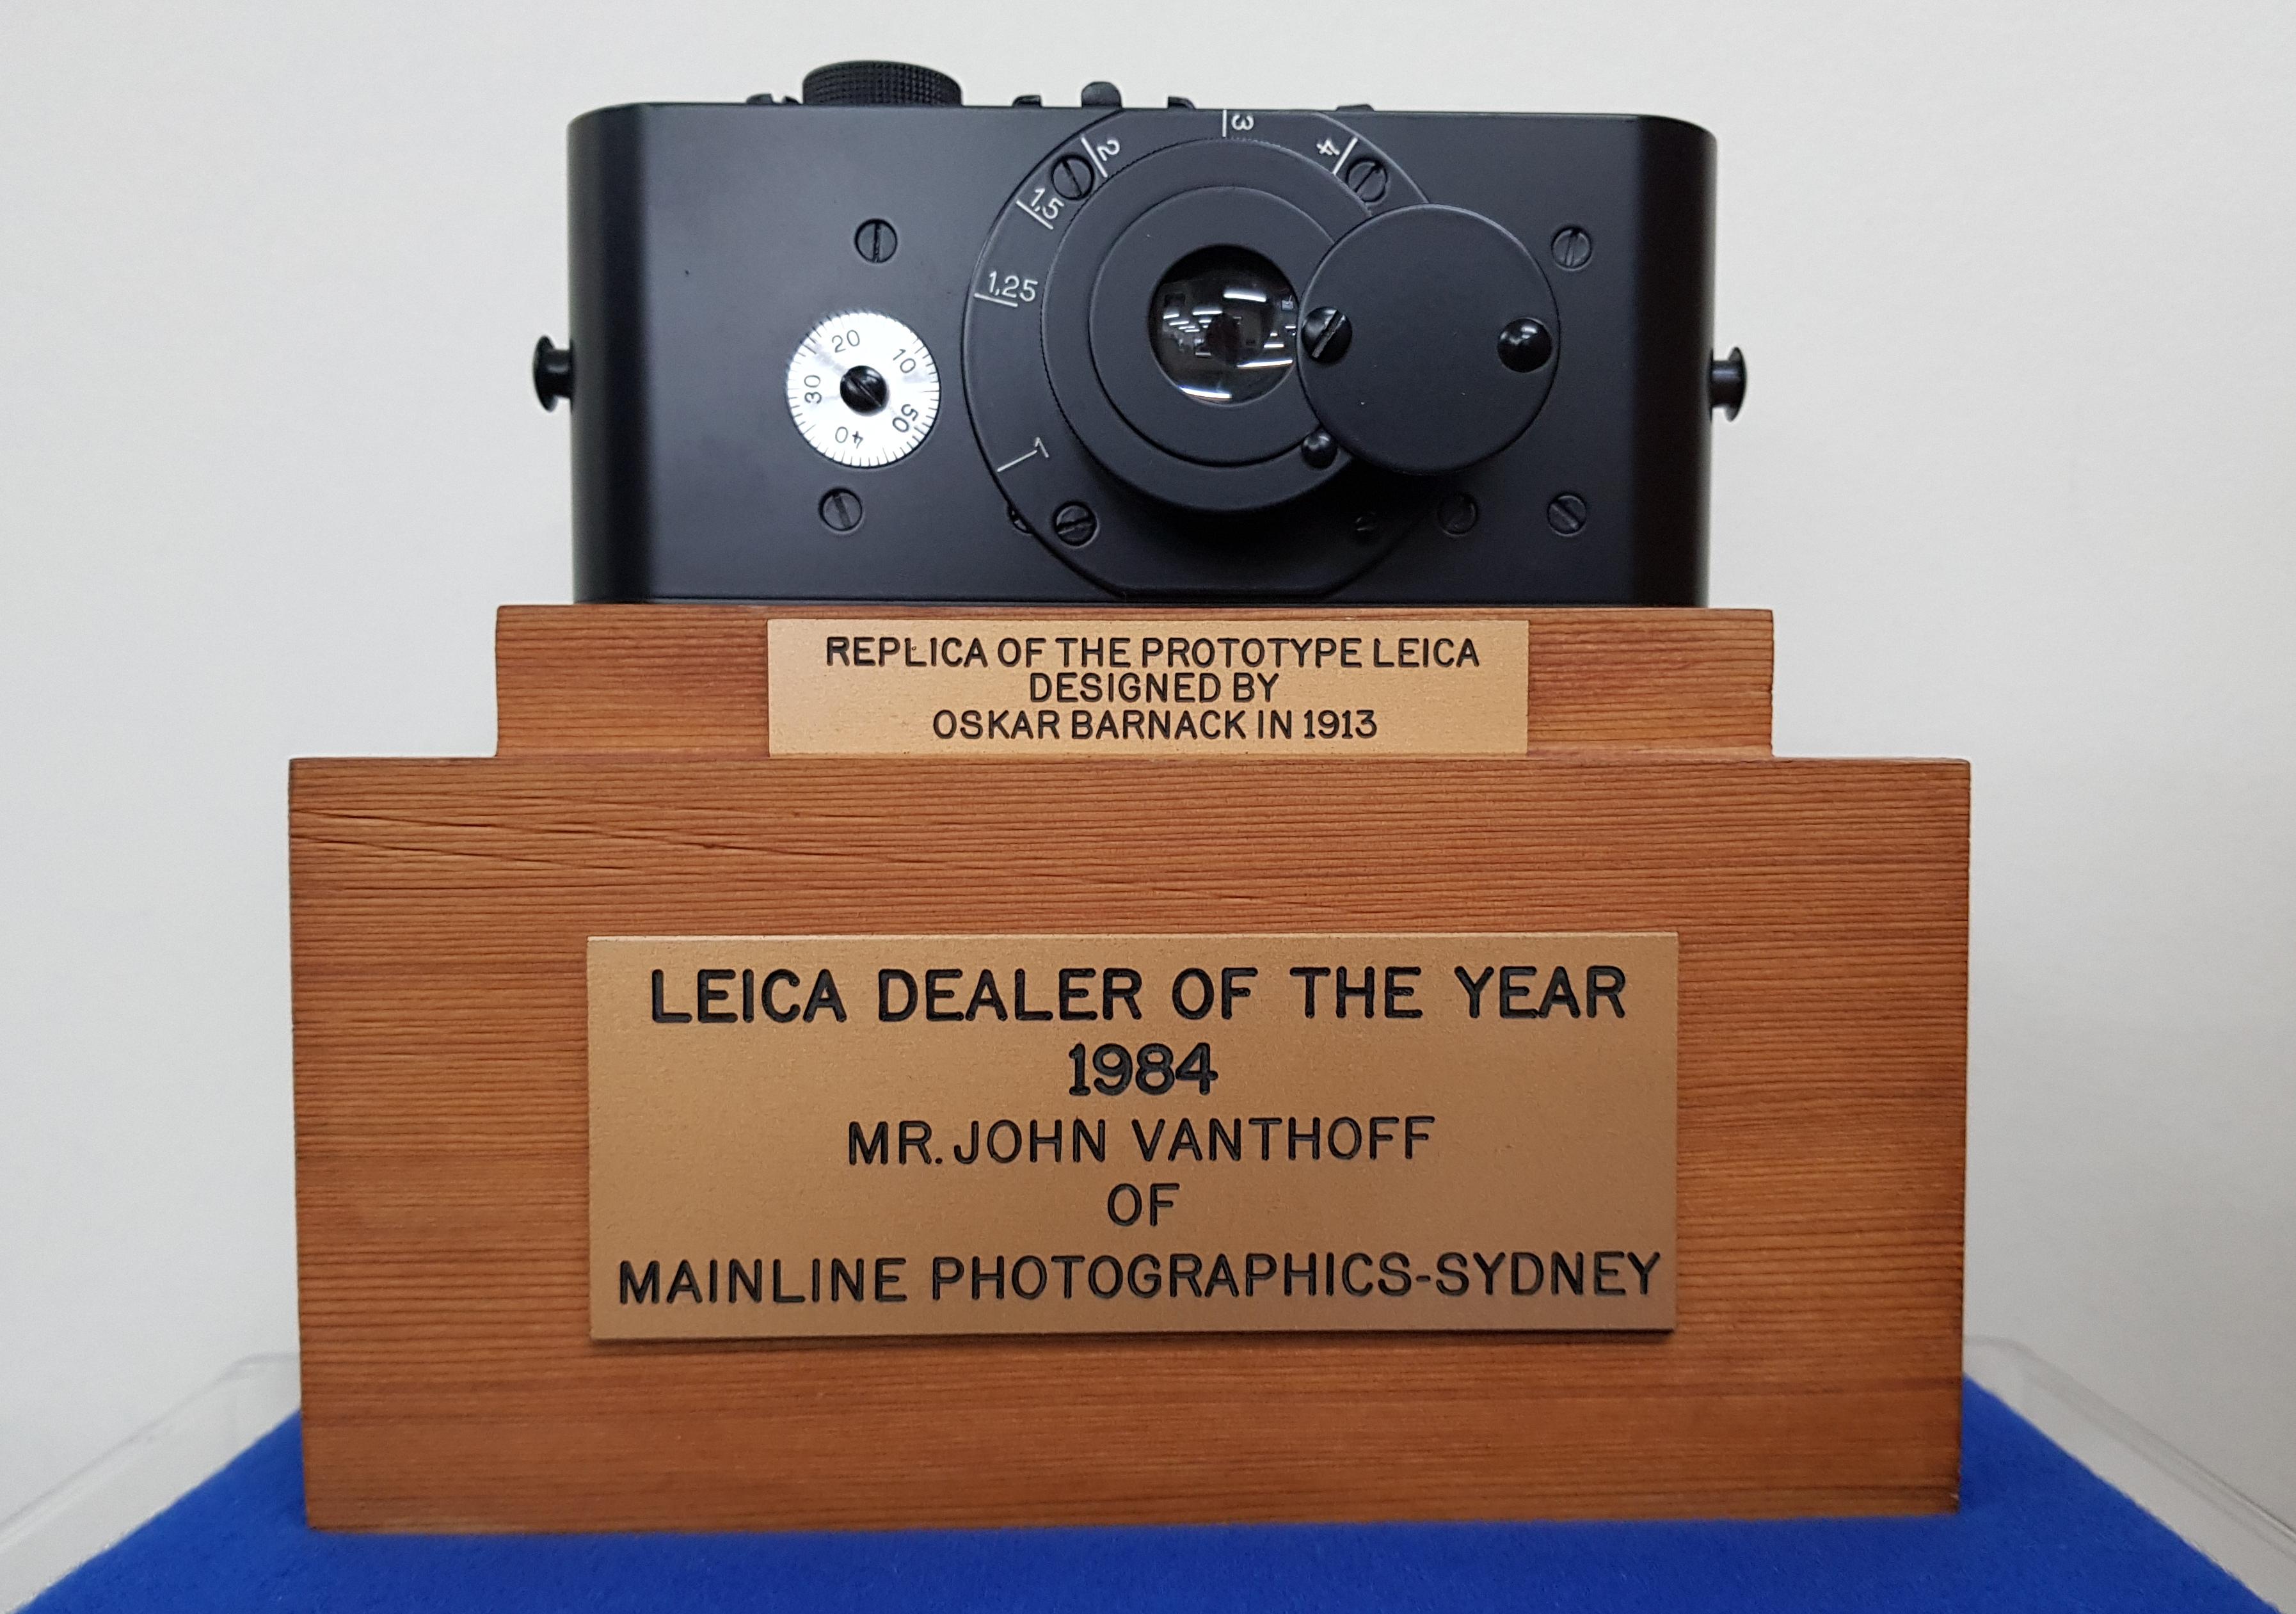 leica-dealer-of-the-year.jpg